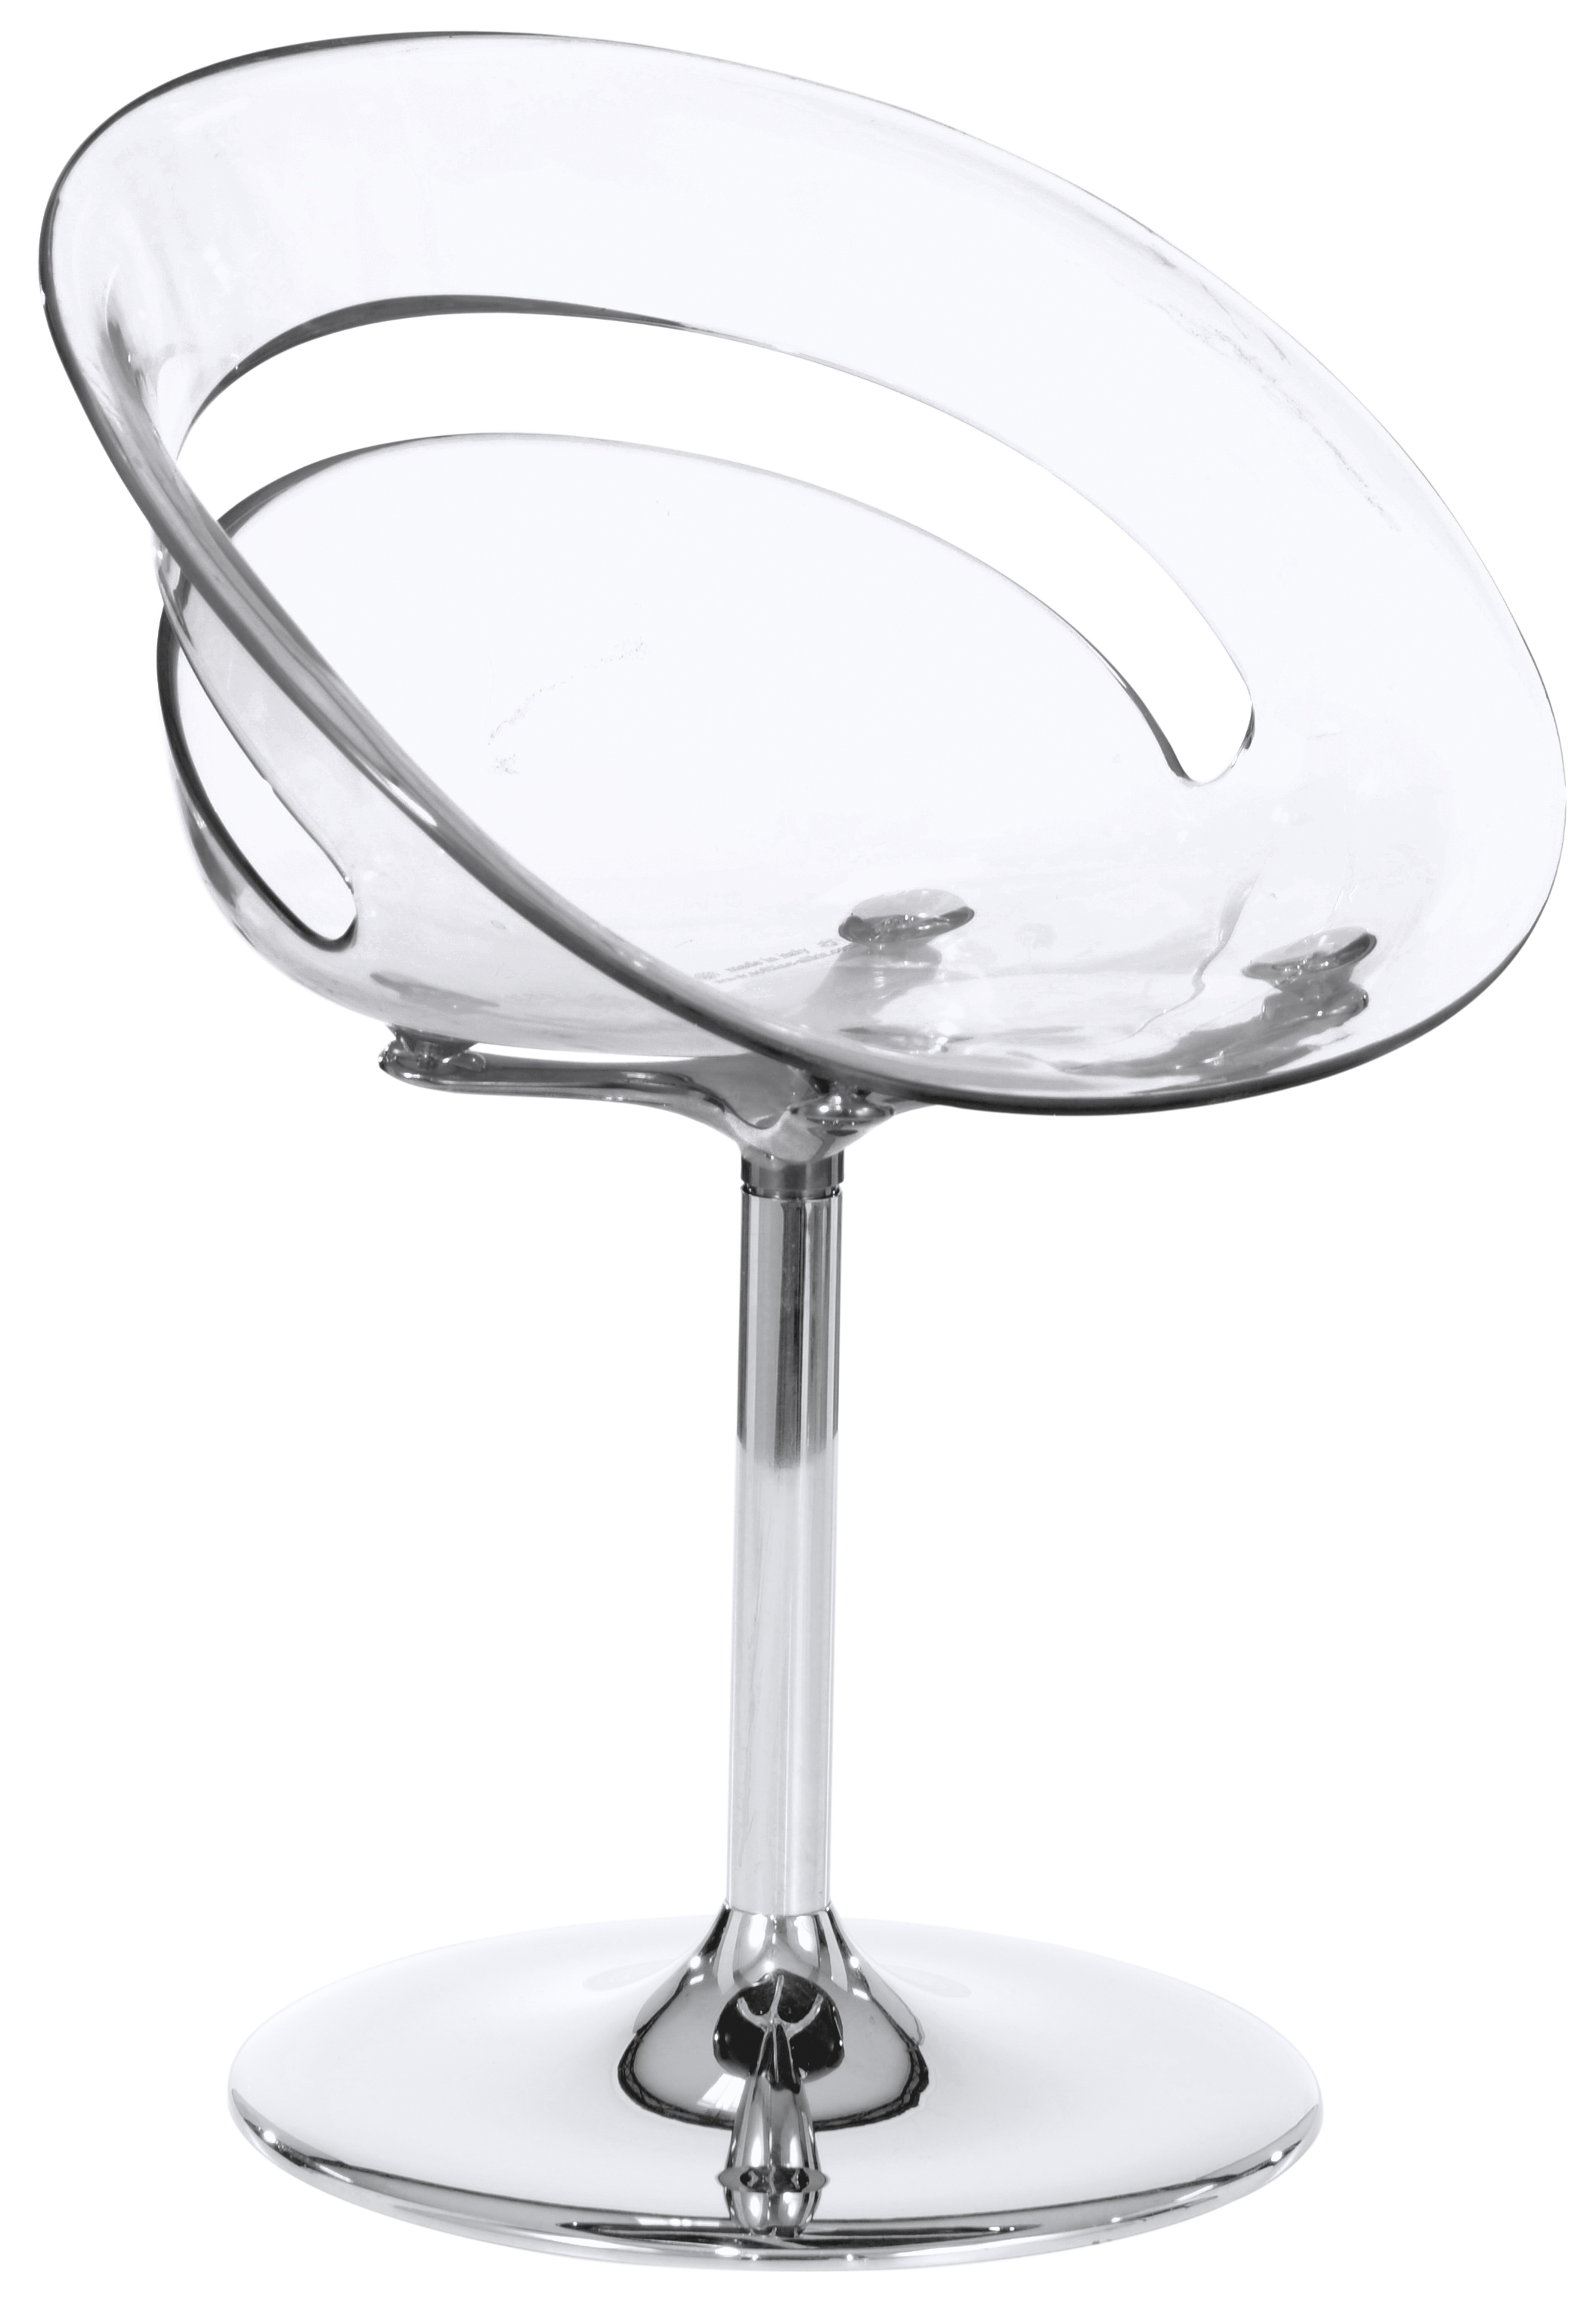 Design-Stuhl Kristina 2 II (Stuhl-Sessel-Stil, ideal für Eisdiele, Gastro, Beauty-Salon, rot / schwarz / weiß / transparent)